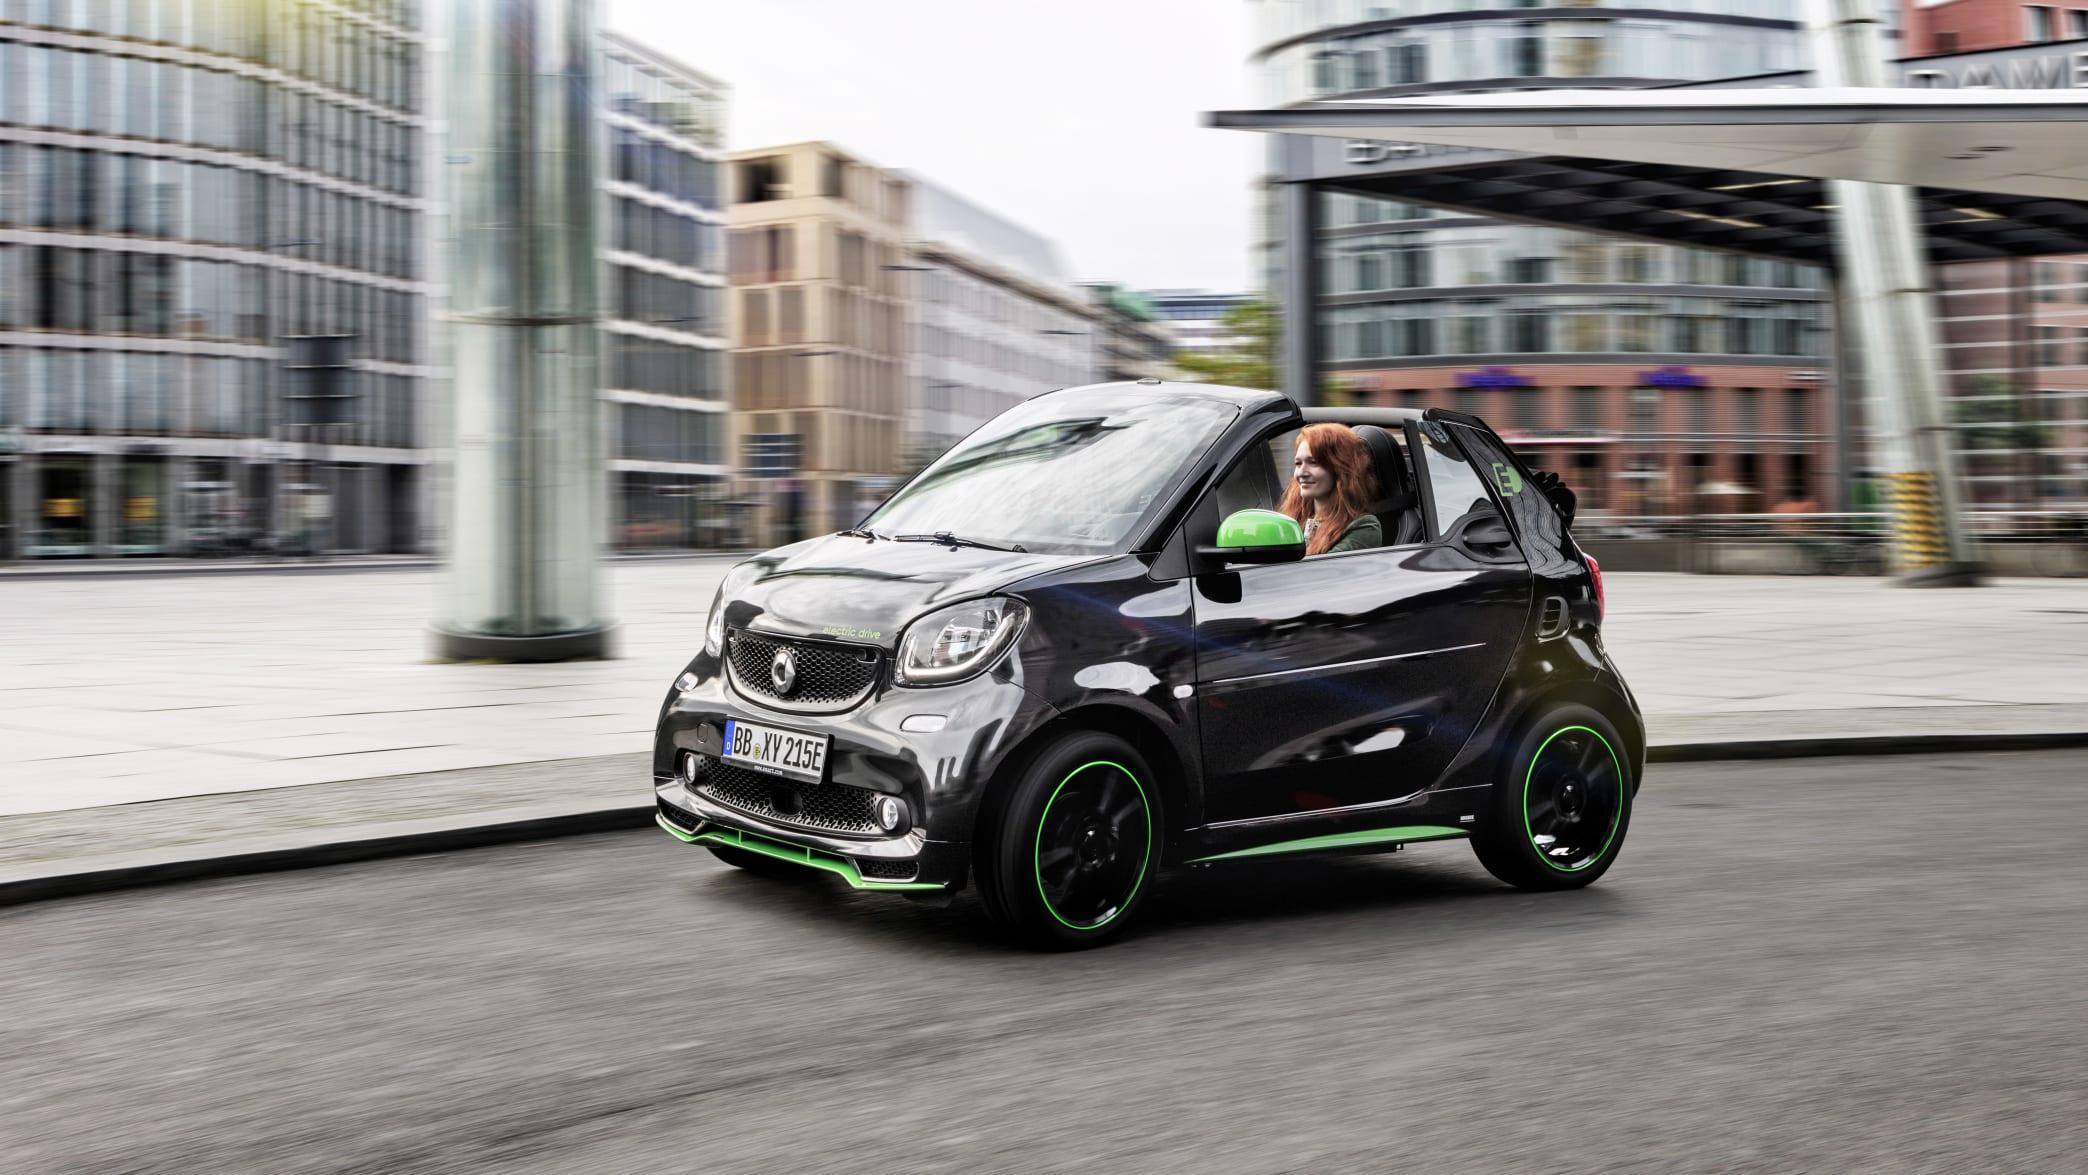 Smart ForTwo Electric Cabrio fahrend auf der Straße